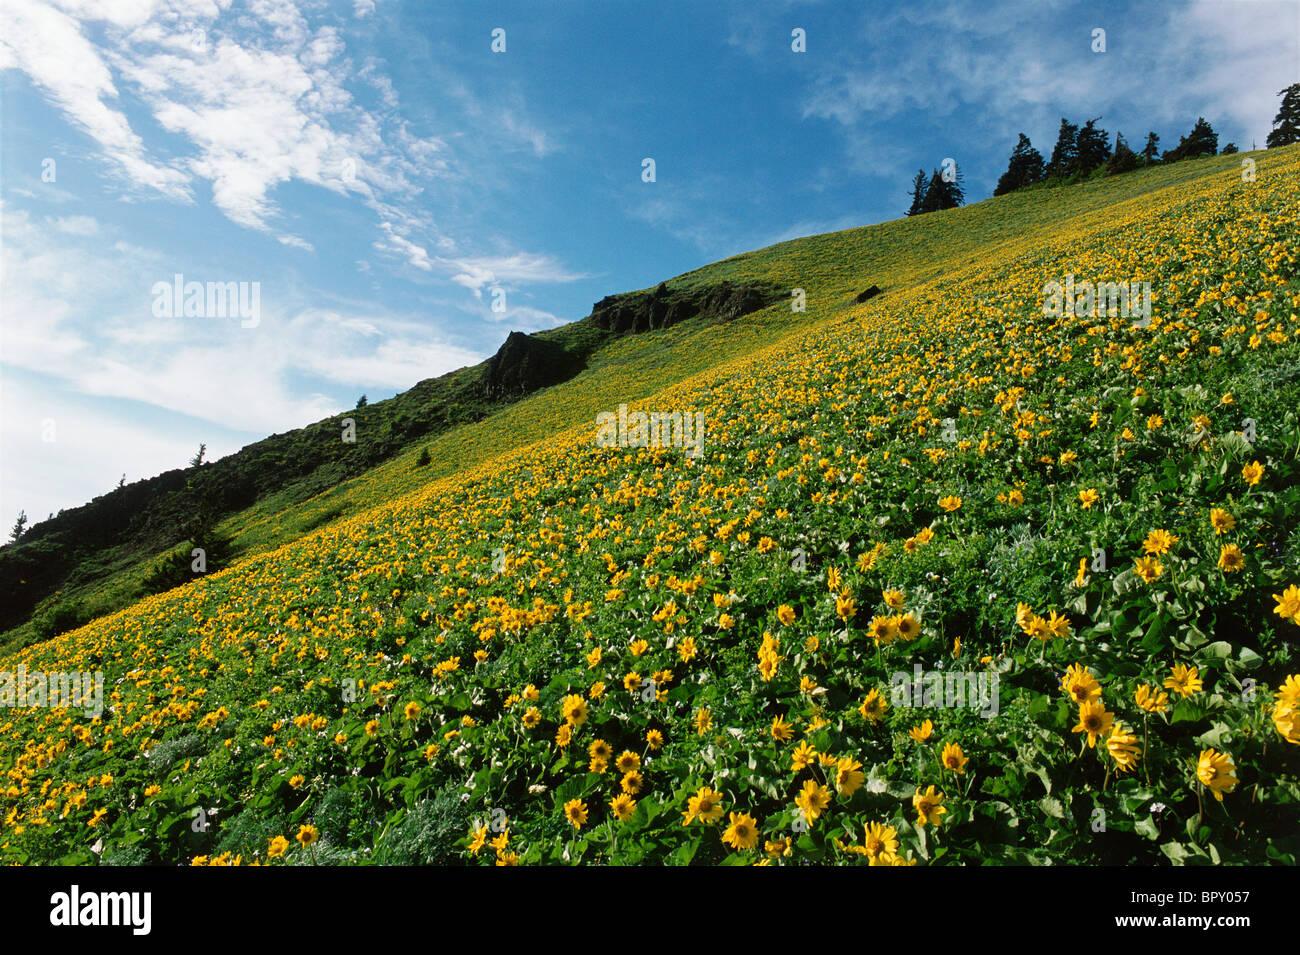 Landscpae - Stock Image